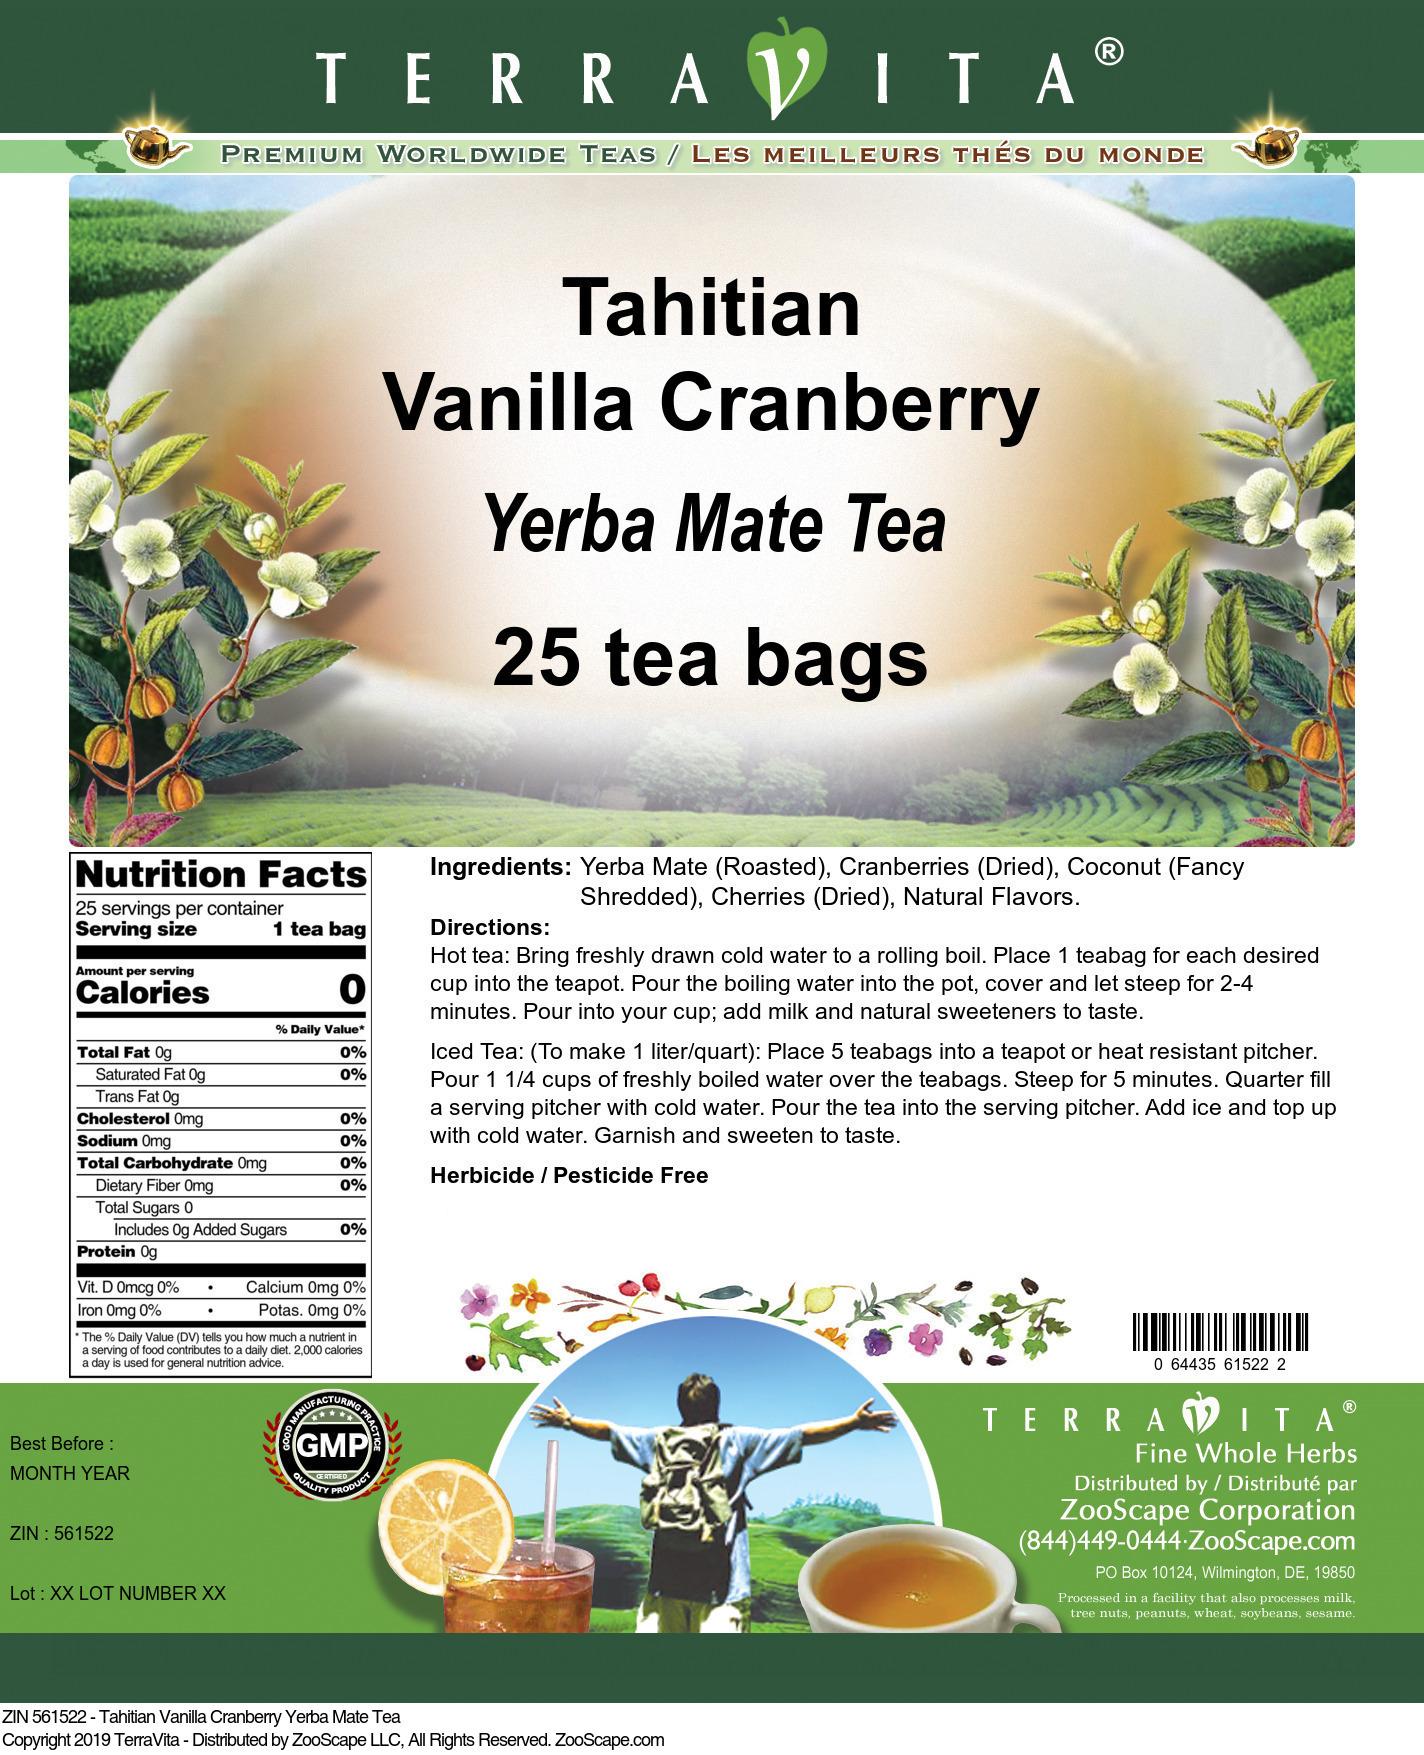 Tahitian Vanilla Cranberry Yerba Mate